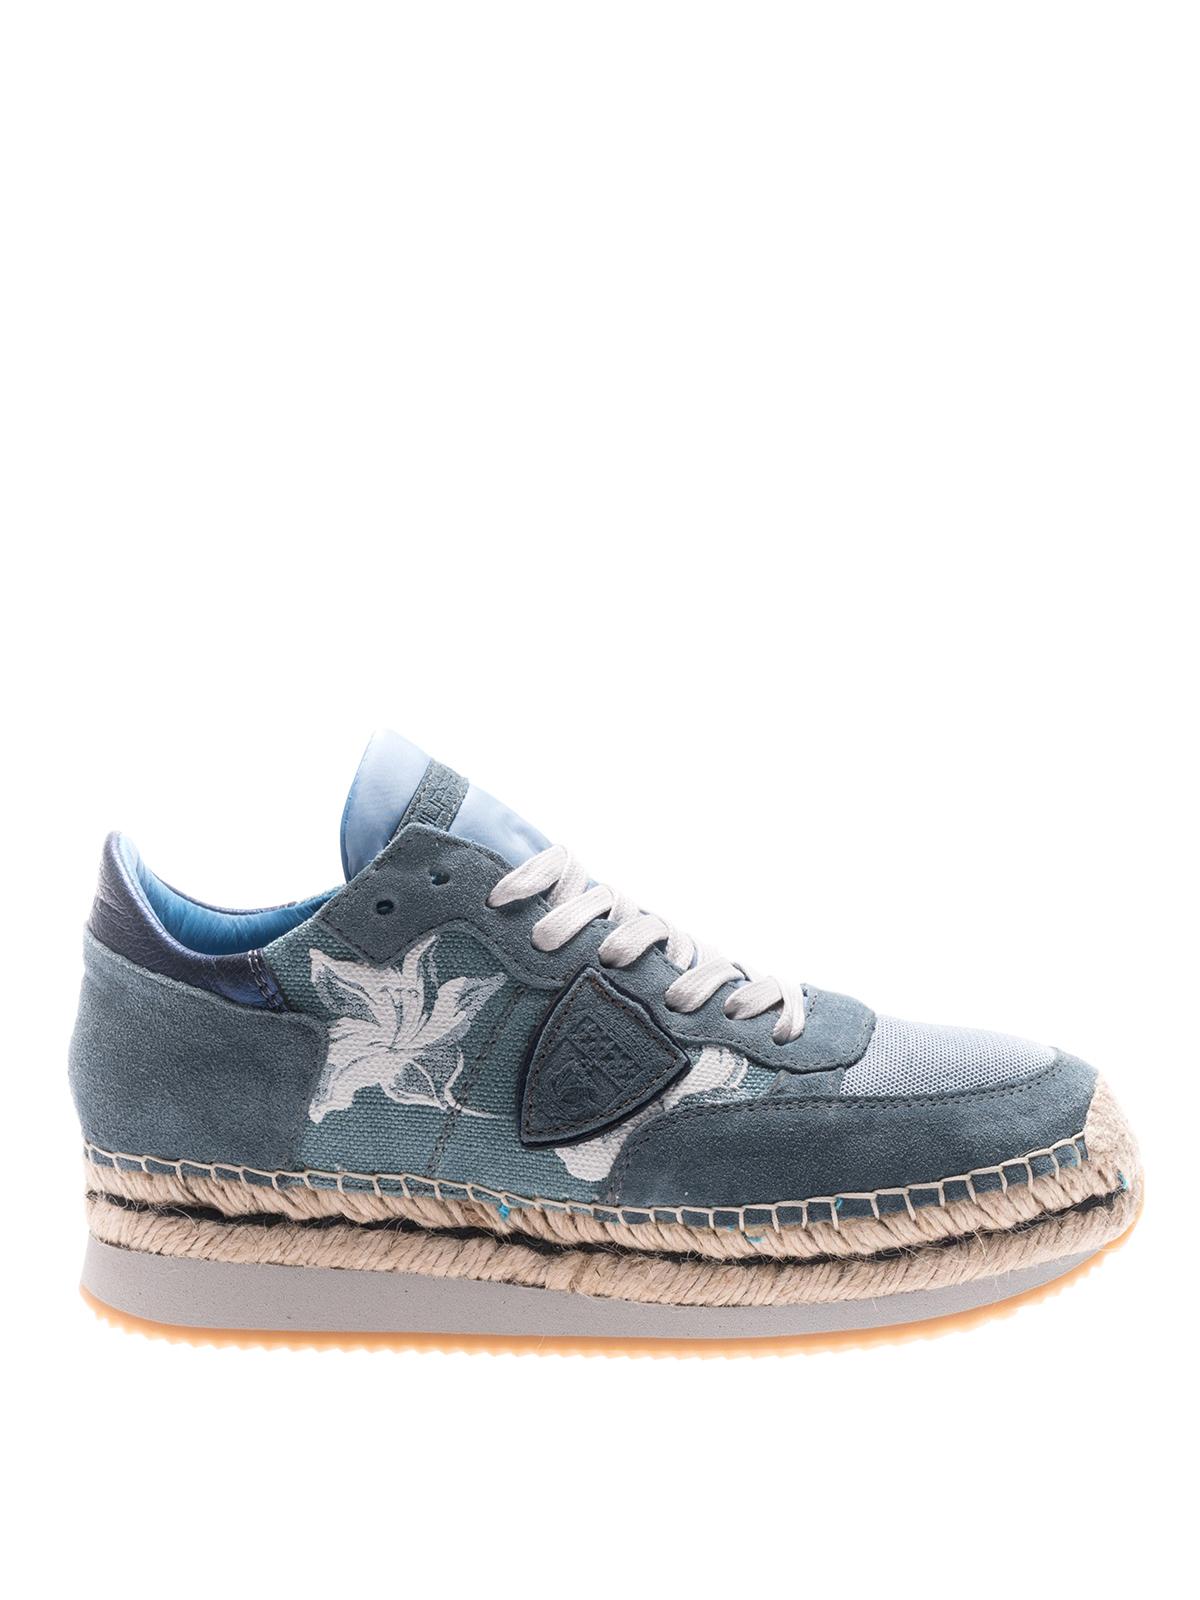 059e5d1e515b philippe-model-trainers-saint-tropez-sneakers-00000125130f00s011.jpg